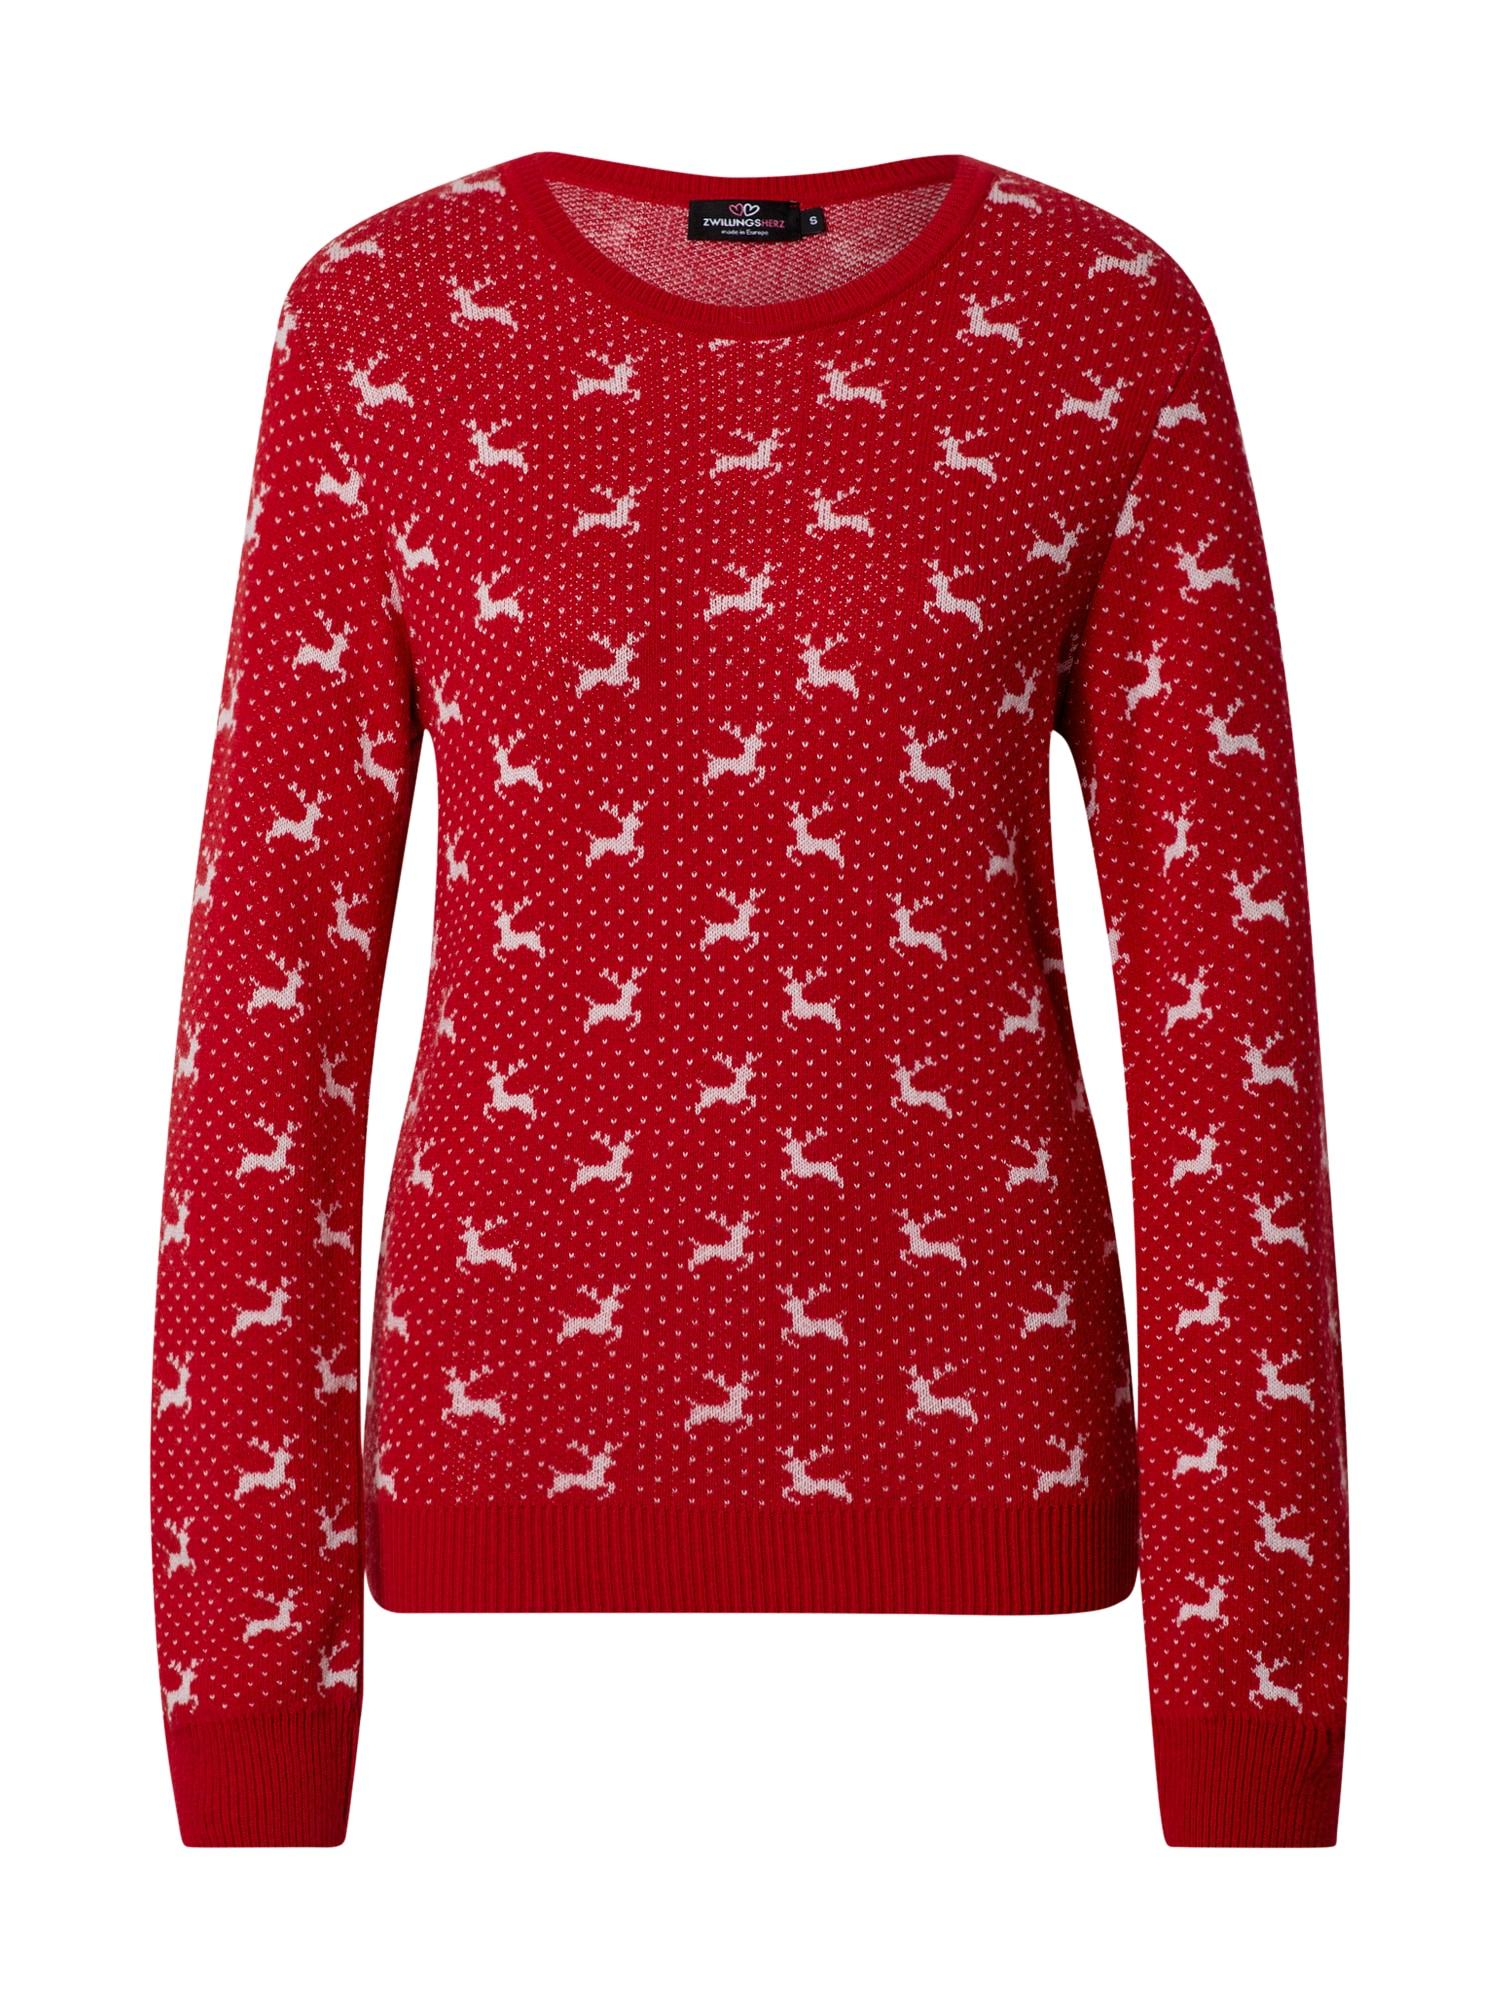 Zwillingsherz Megztinis raudona / balta